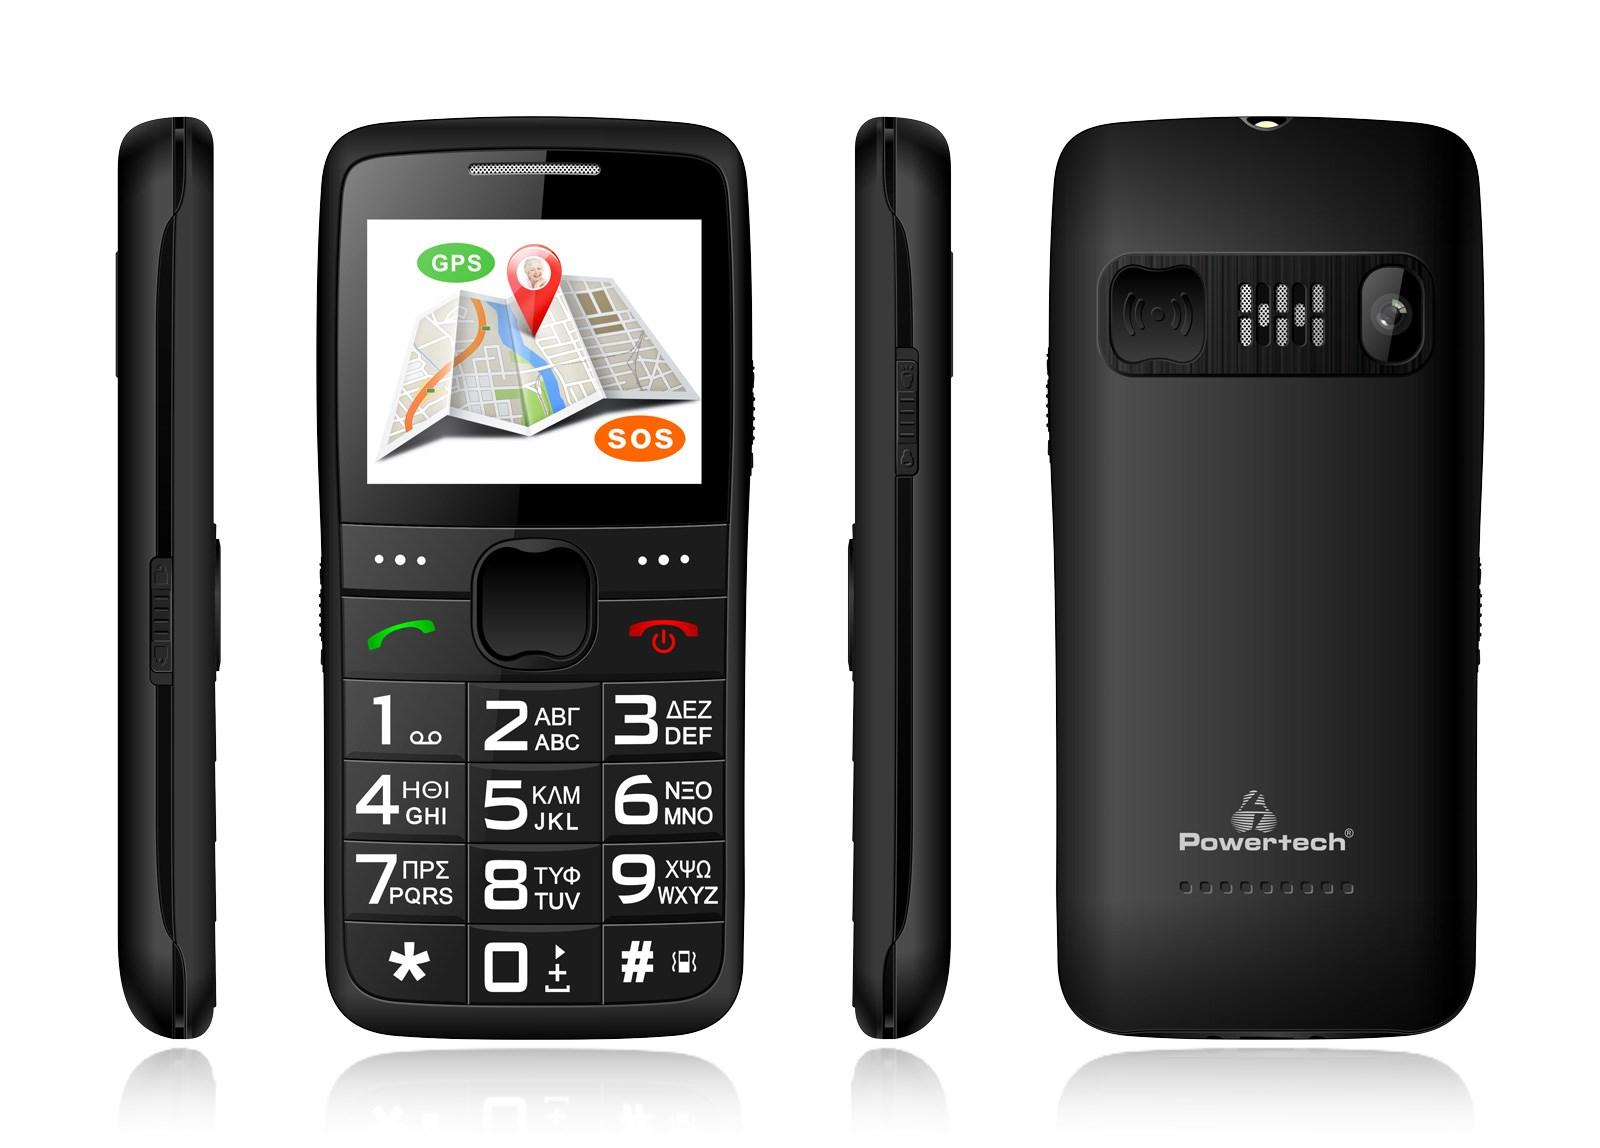 POWERTECH Κινητό Τηλέφωνο Sentry GPS PTM-12, SOS Call, με φακό, μαύρο - POWERTECH 22092